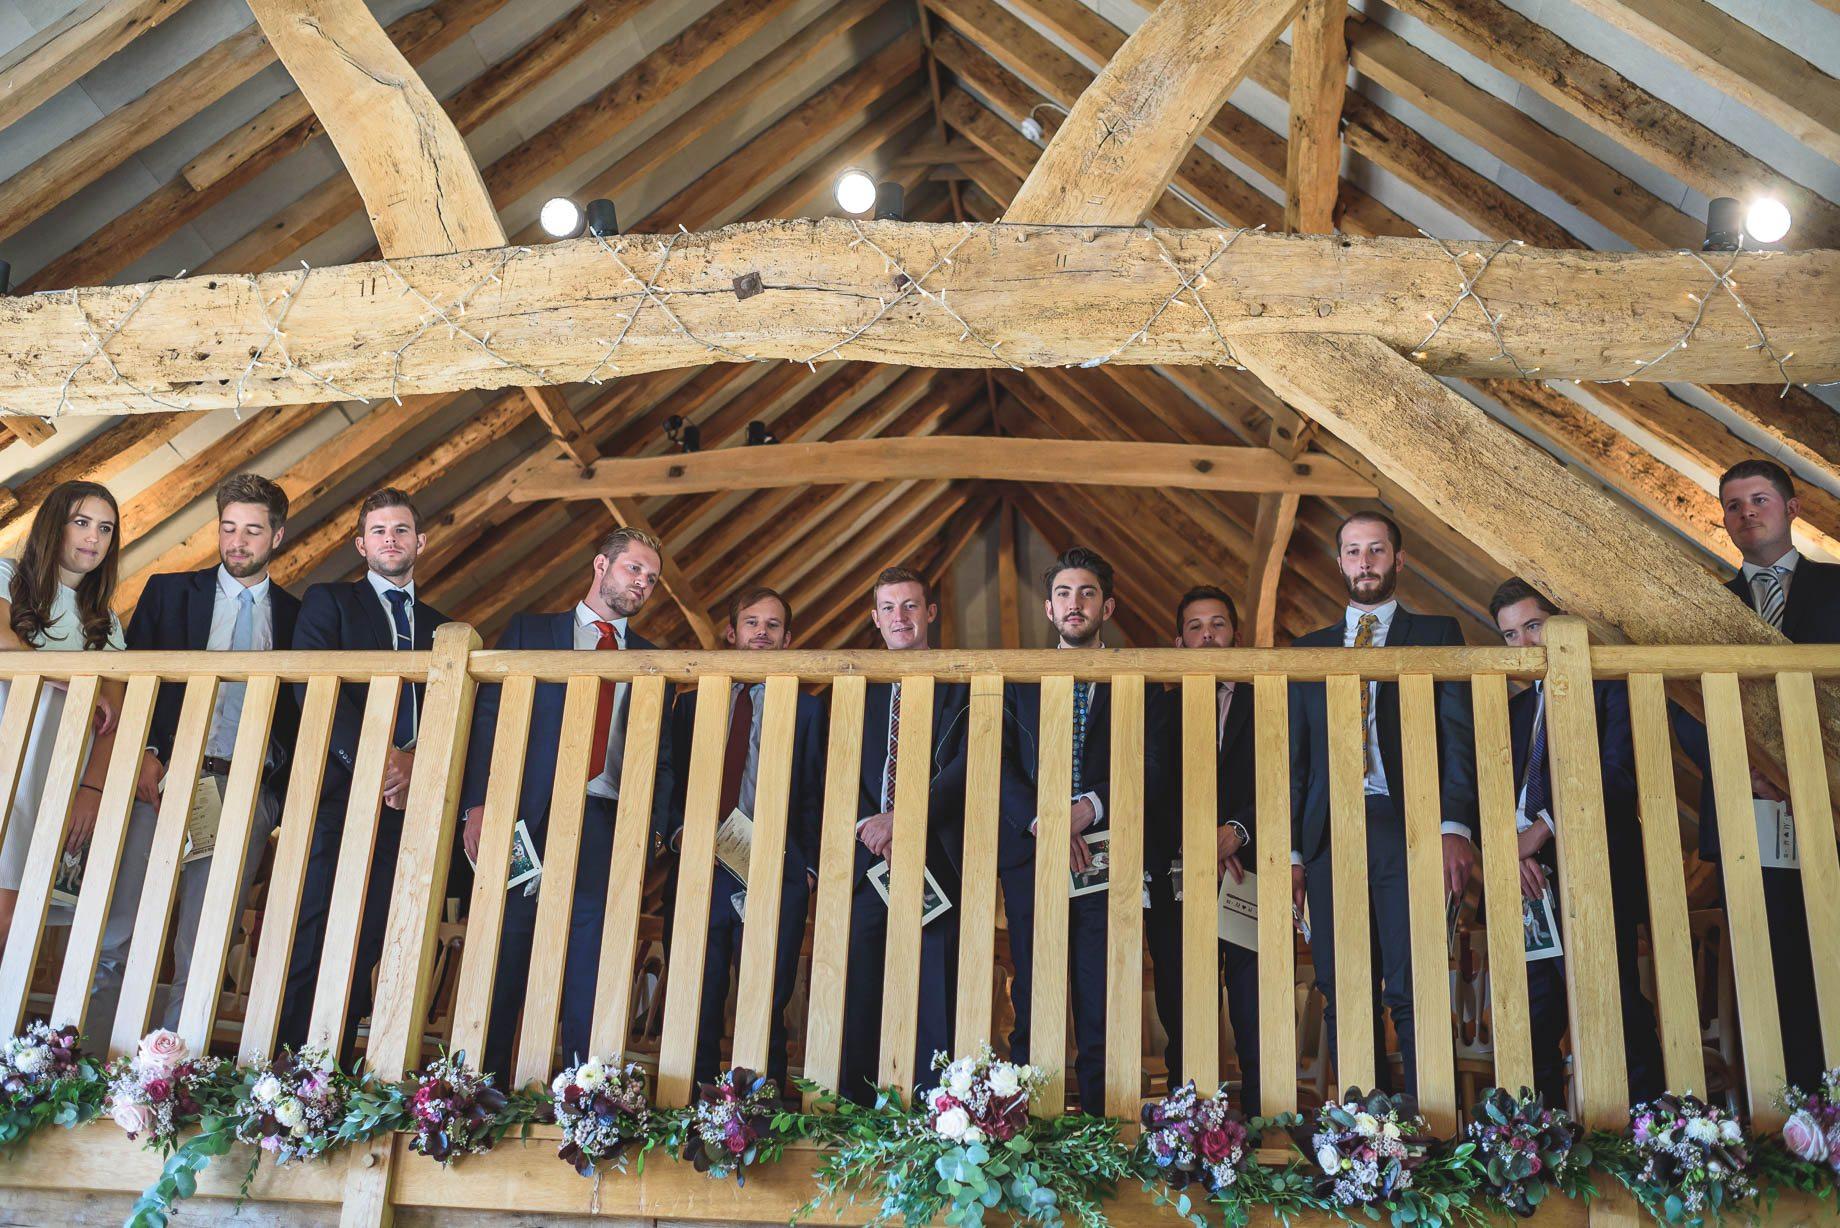 Bury-Court-Barn-wedding-photography-Guy-Collier-Hannah-and-Mark-61-of-191